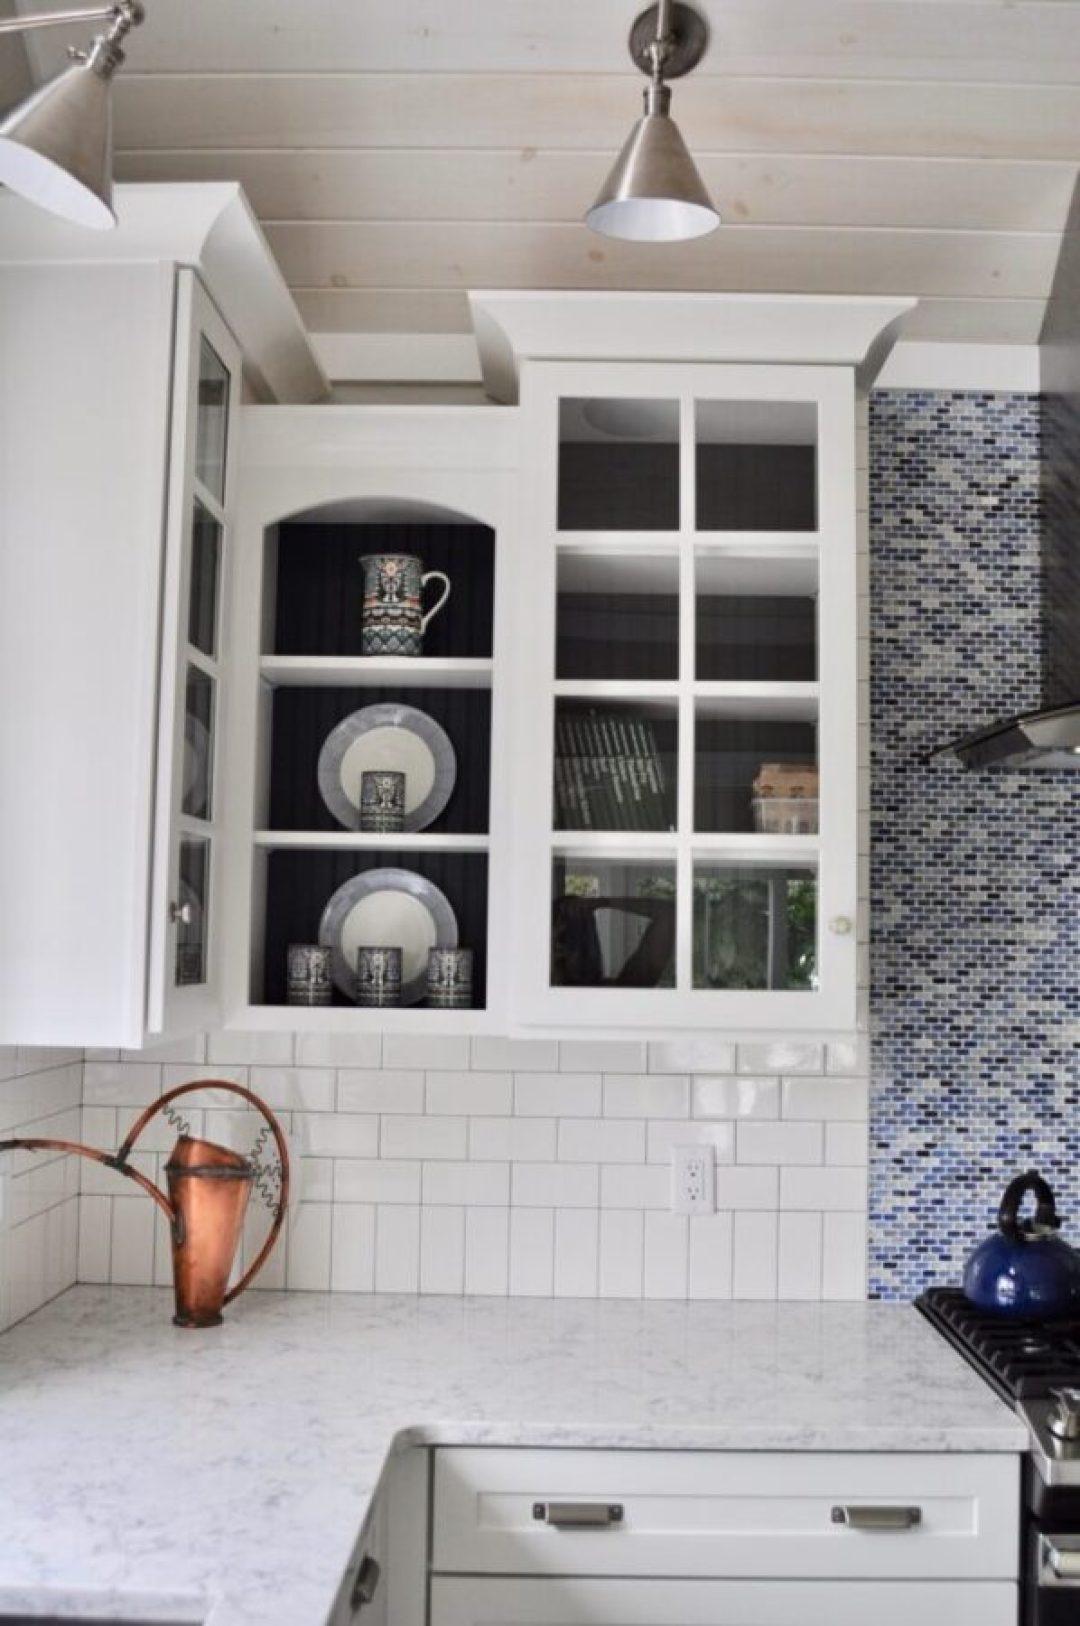 Kitchen design with cottage charm